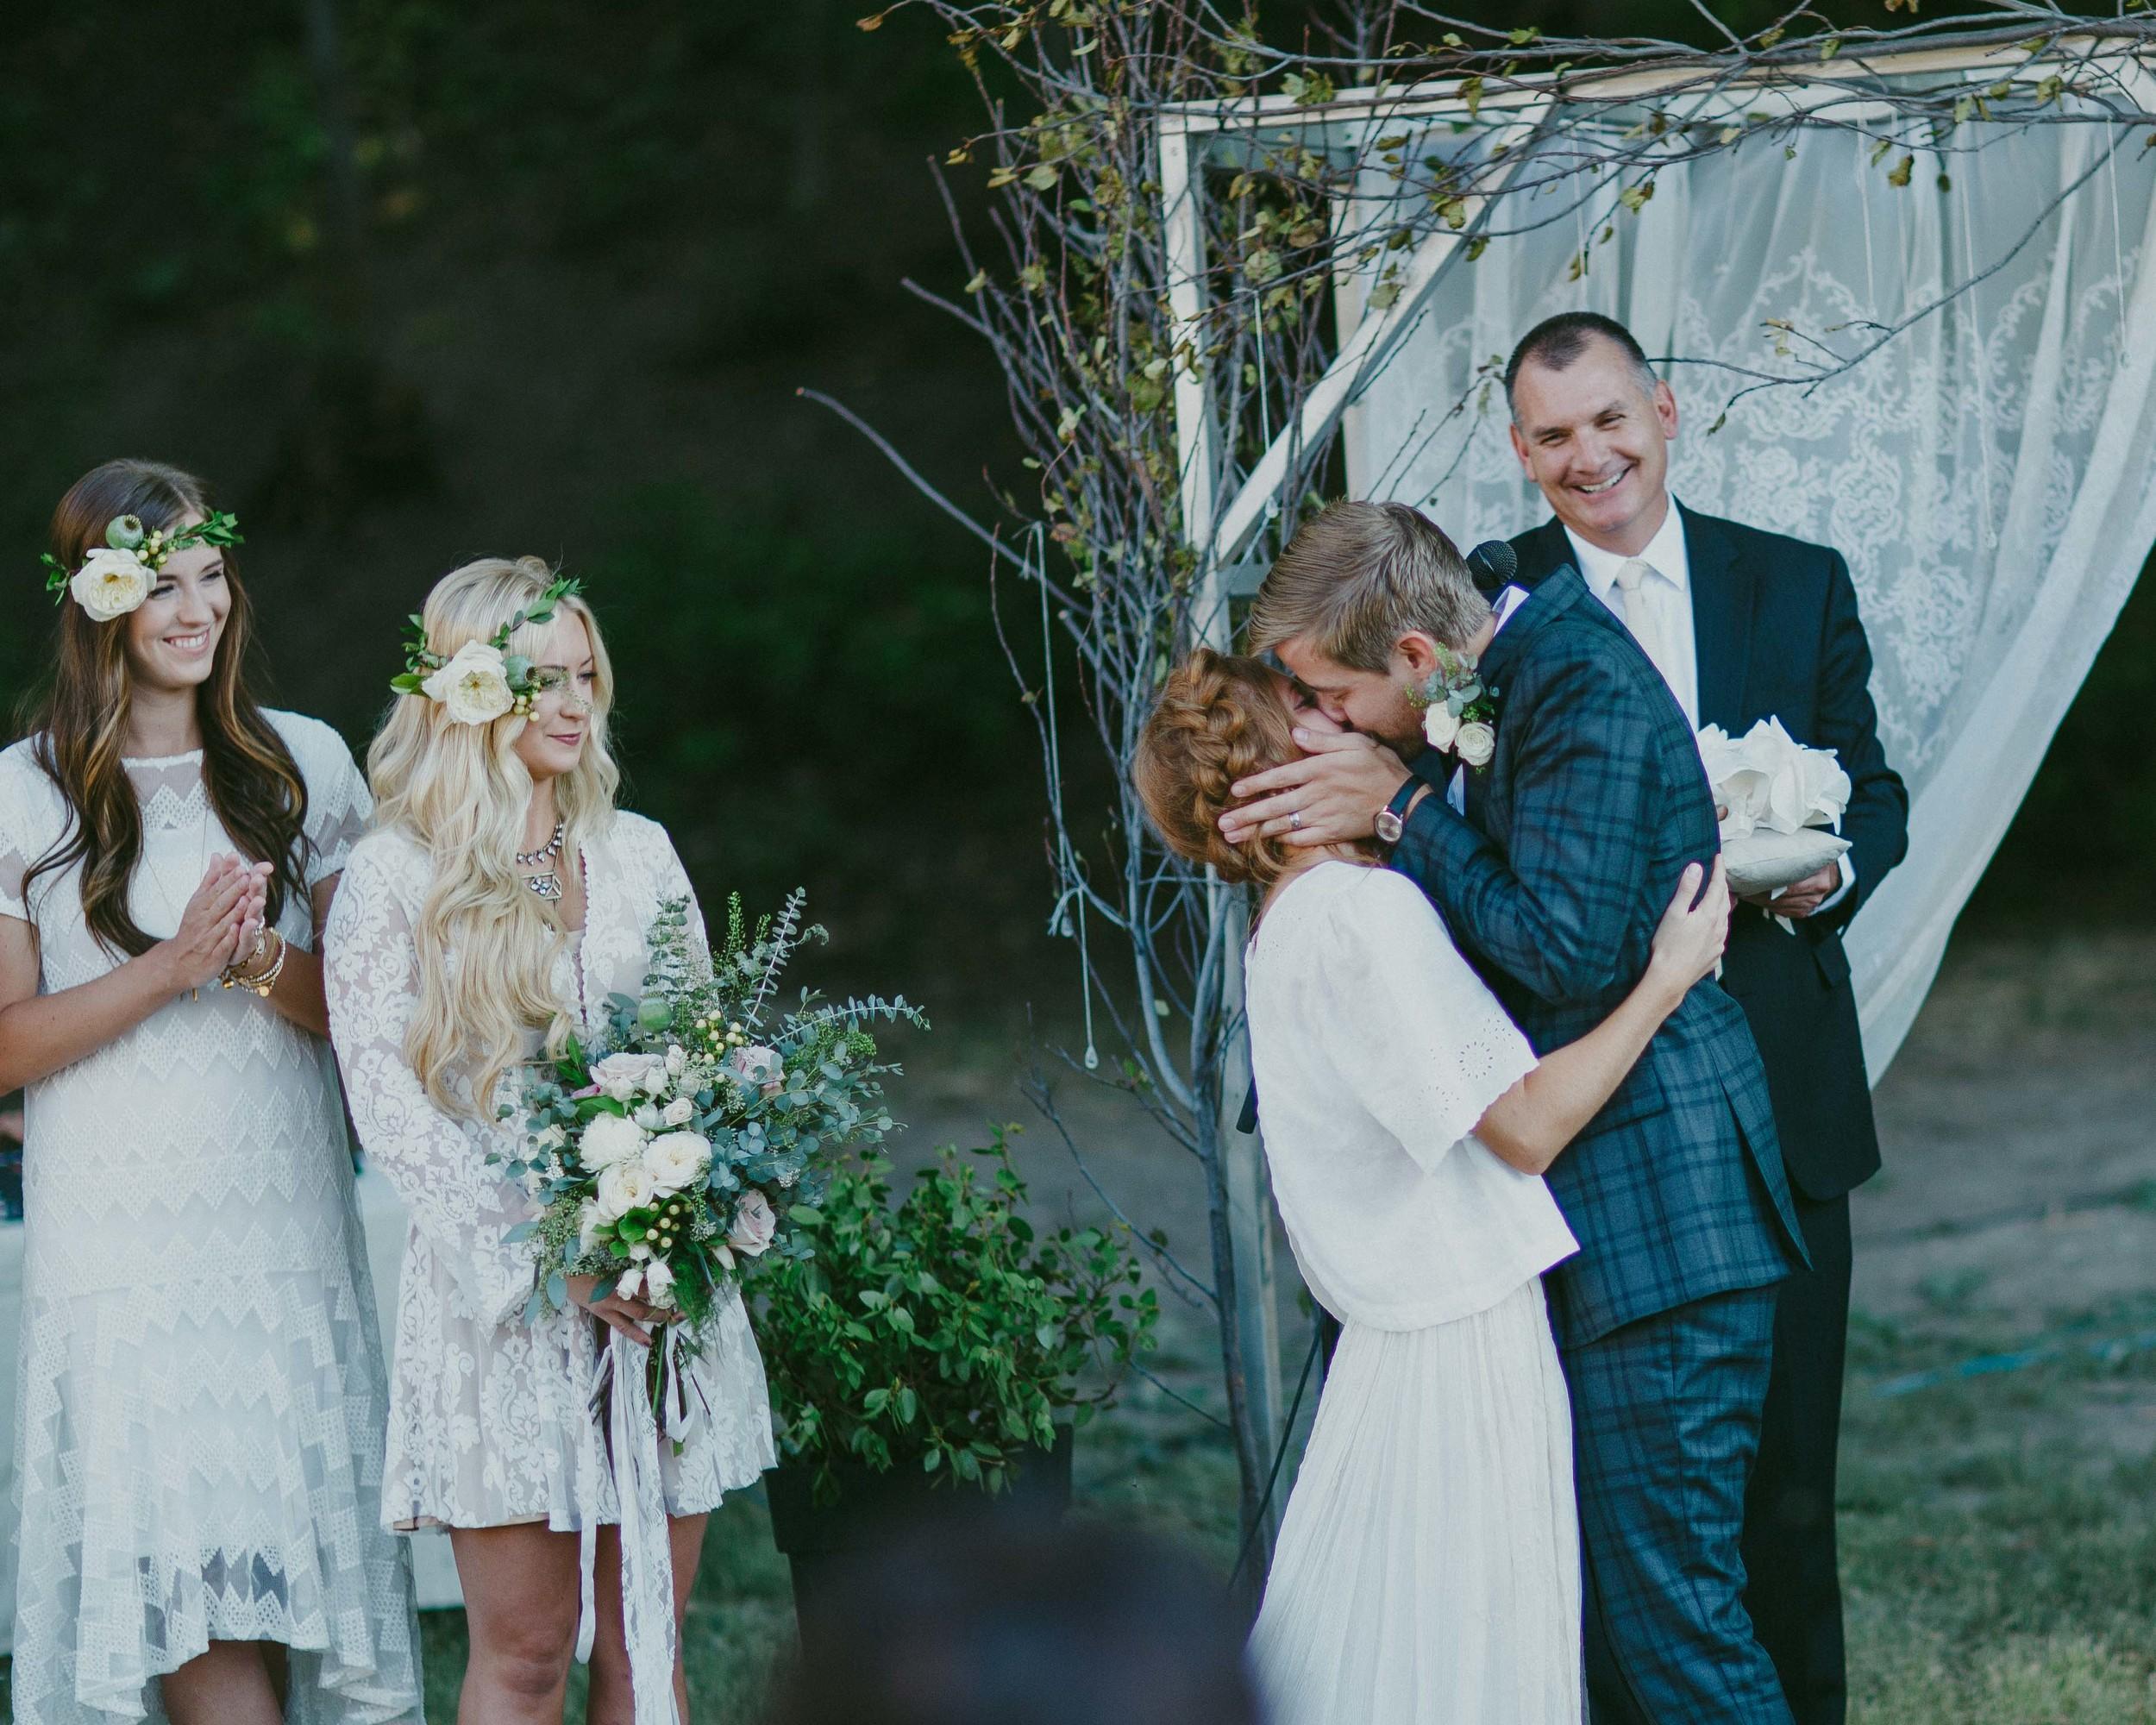 Salt-Lake-City-Utah-Wedding-Photographer-15.jpg